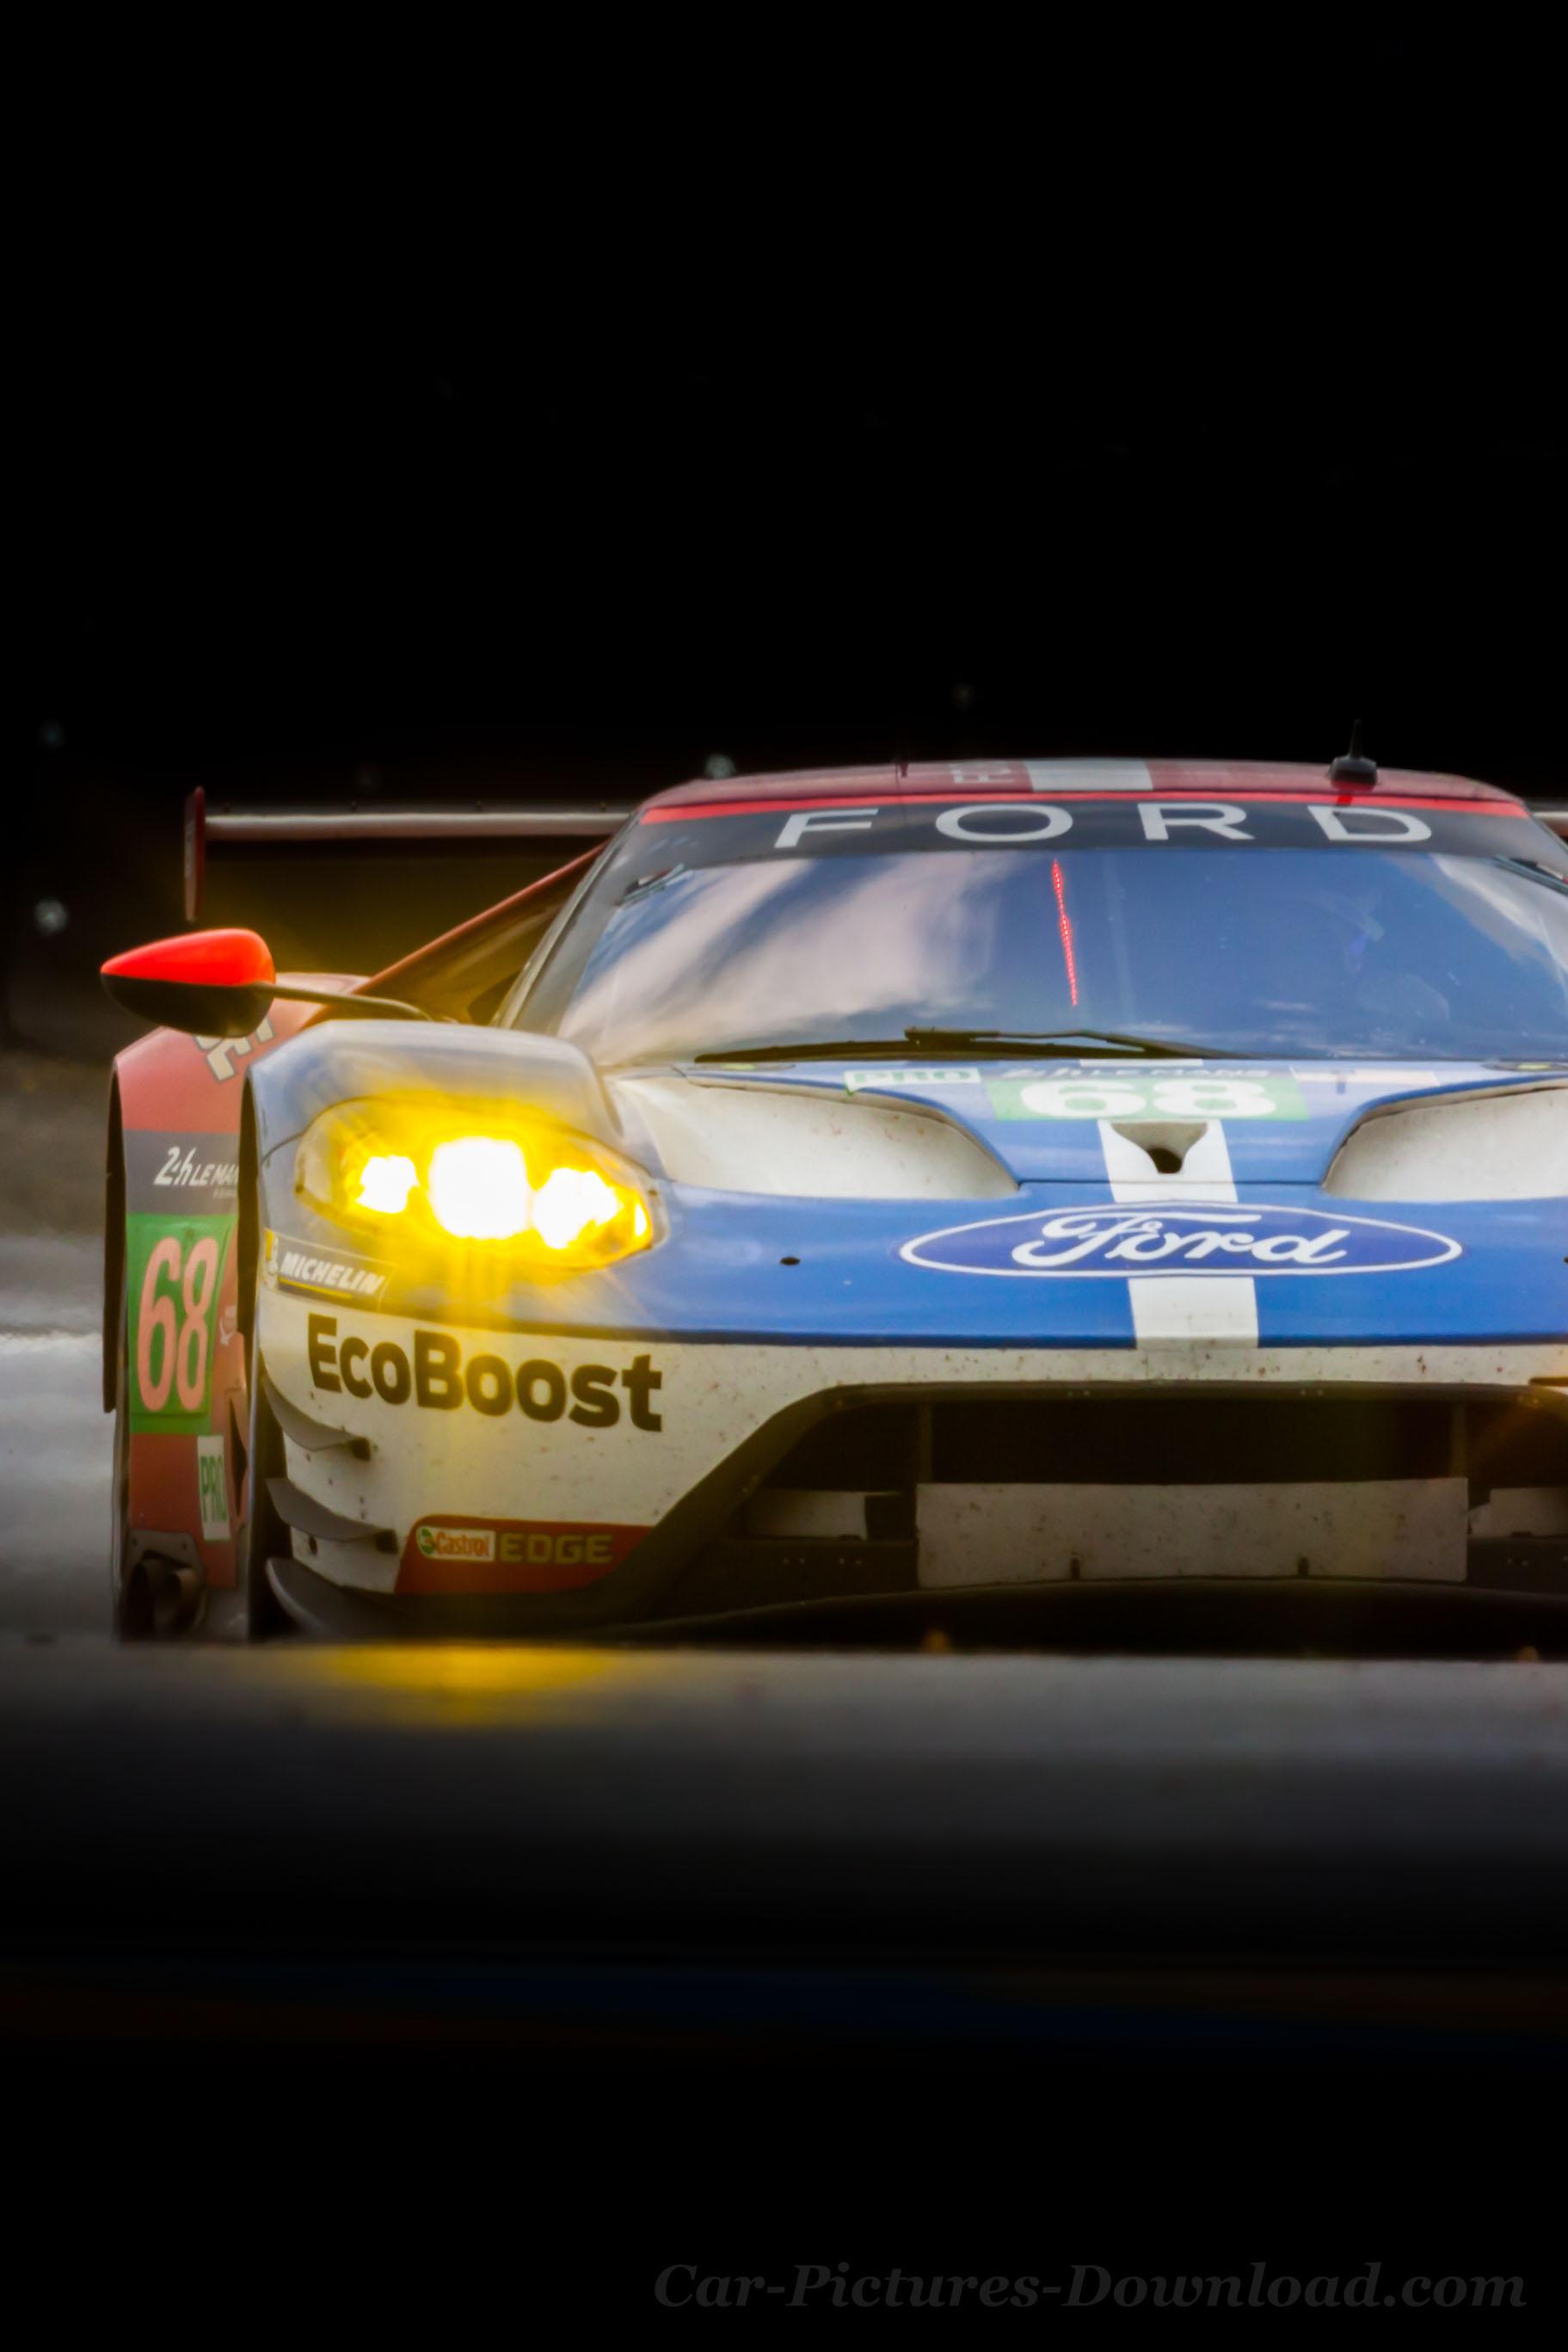 Ford Racing Wallpaper Race Car 2975397 Hd Wallpaper Backgrounds Download